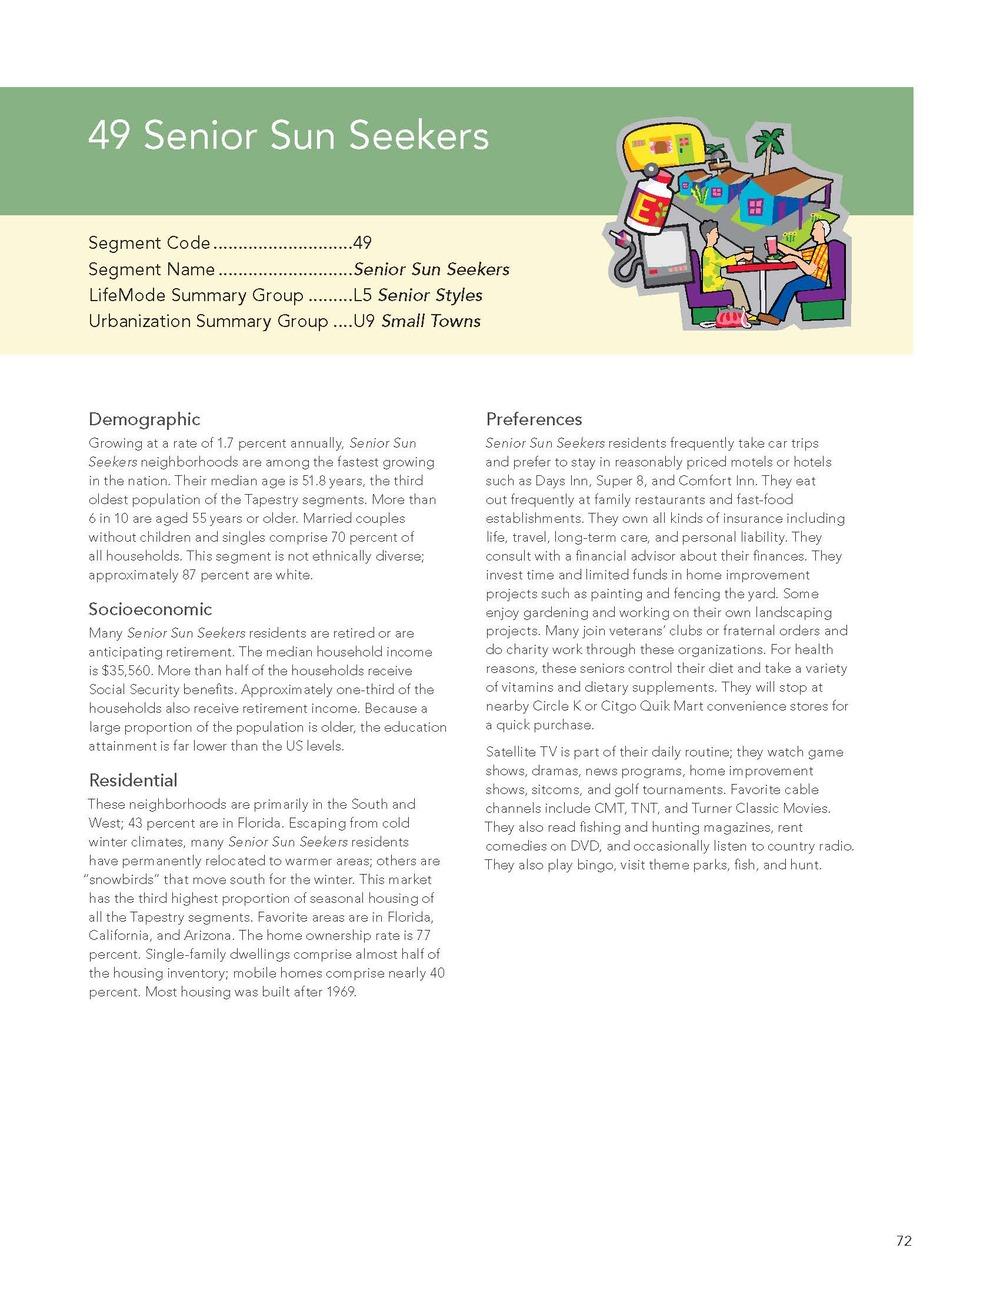 tapestry-segmentation_Page_75.jpg